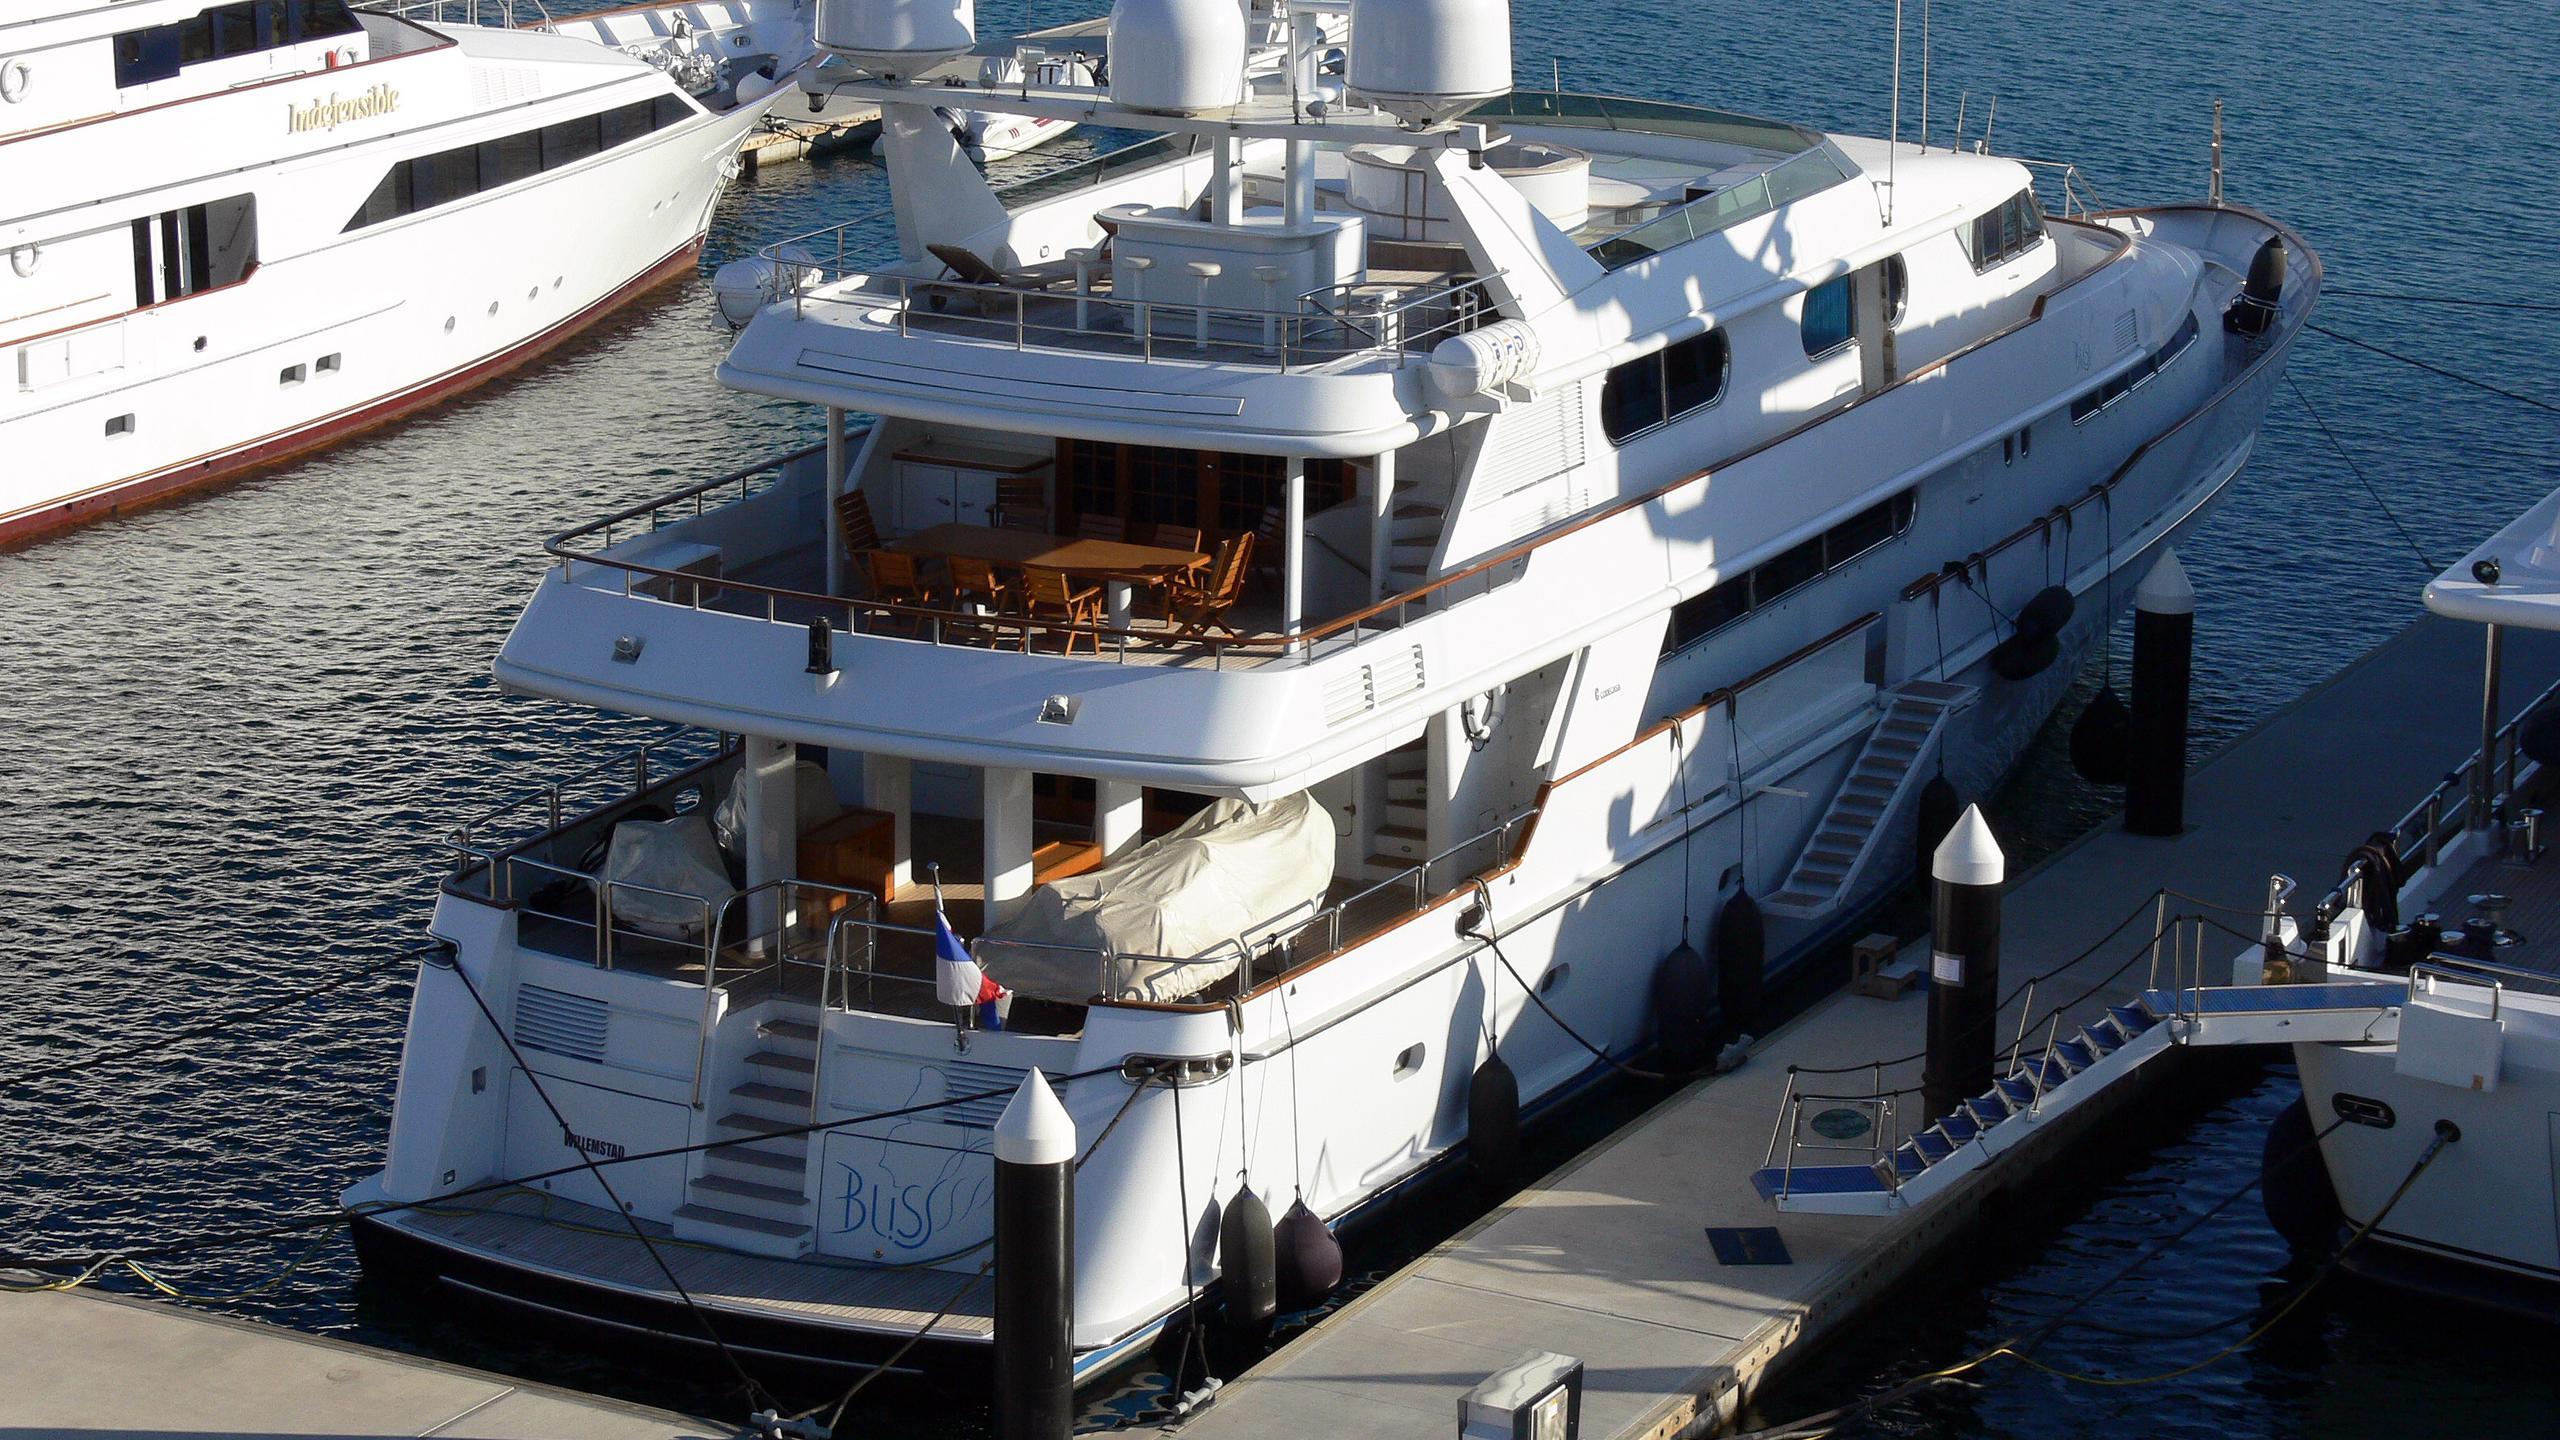 xana-ouranos-too-motor-yacht-codecasa-1994-40m-cruising-aerial-stern